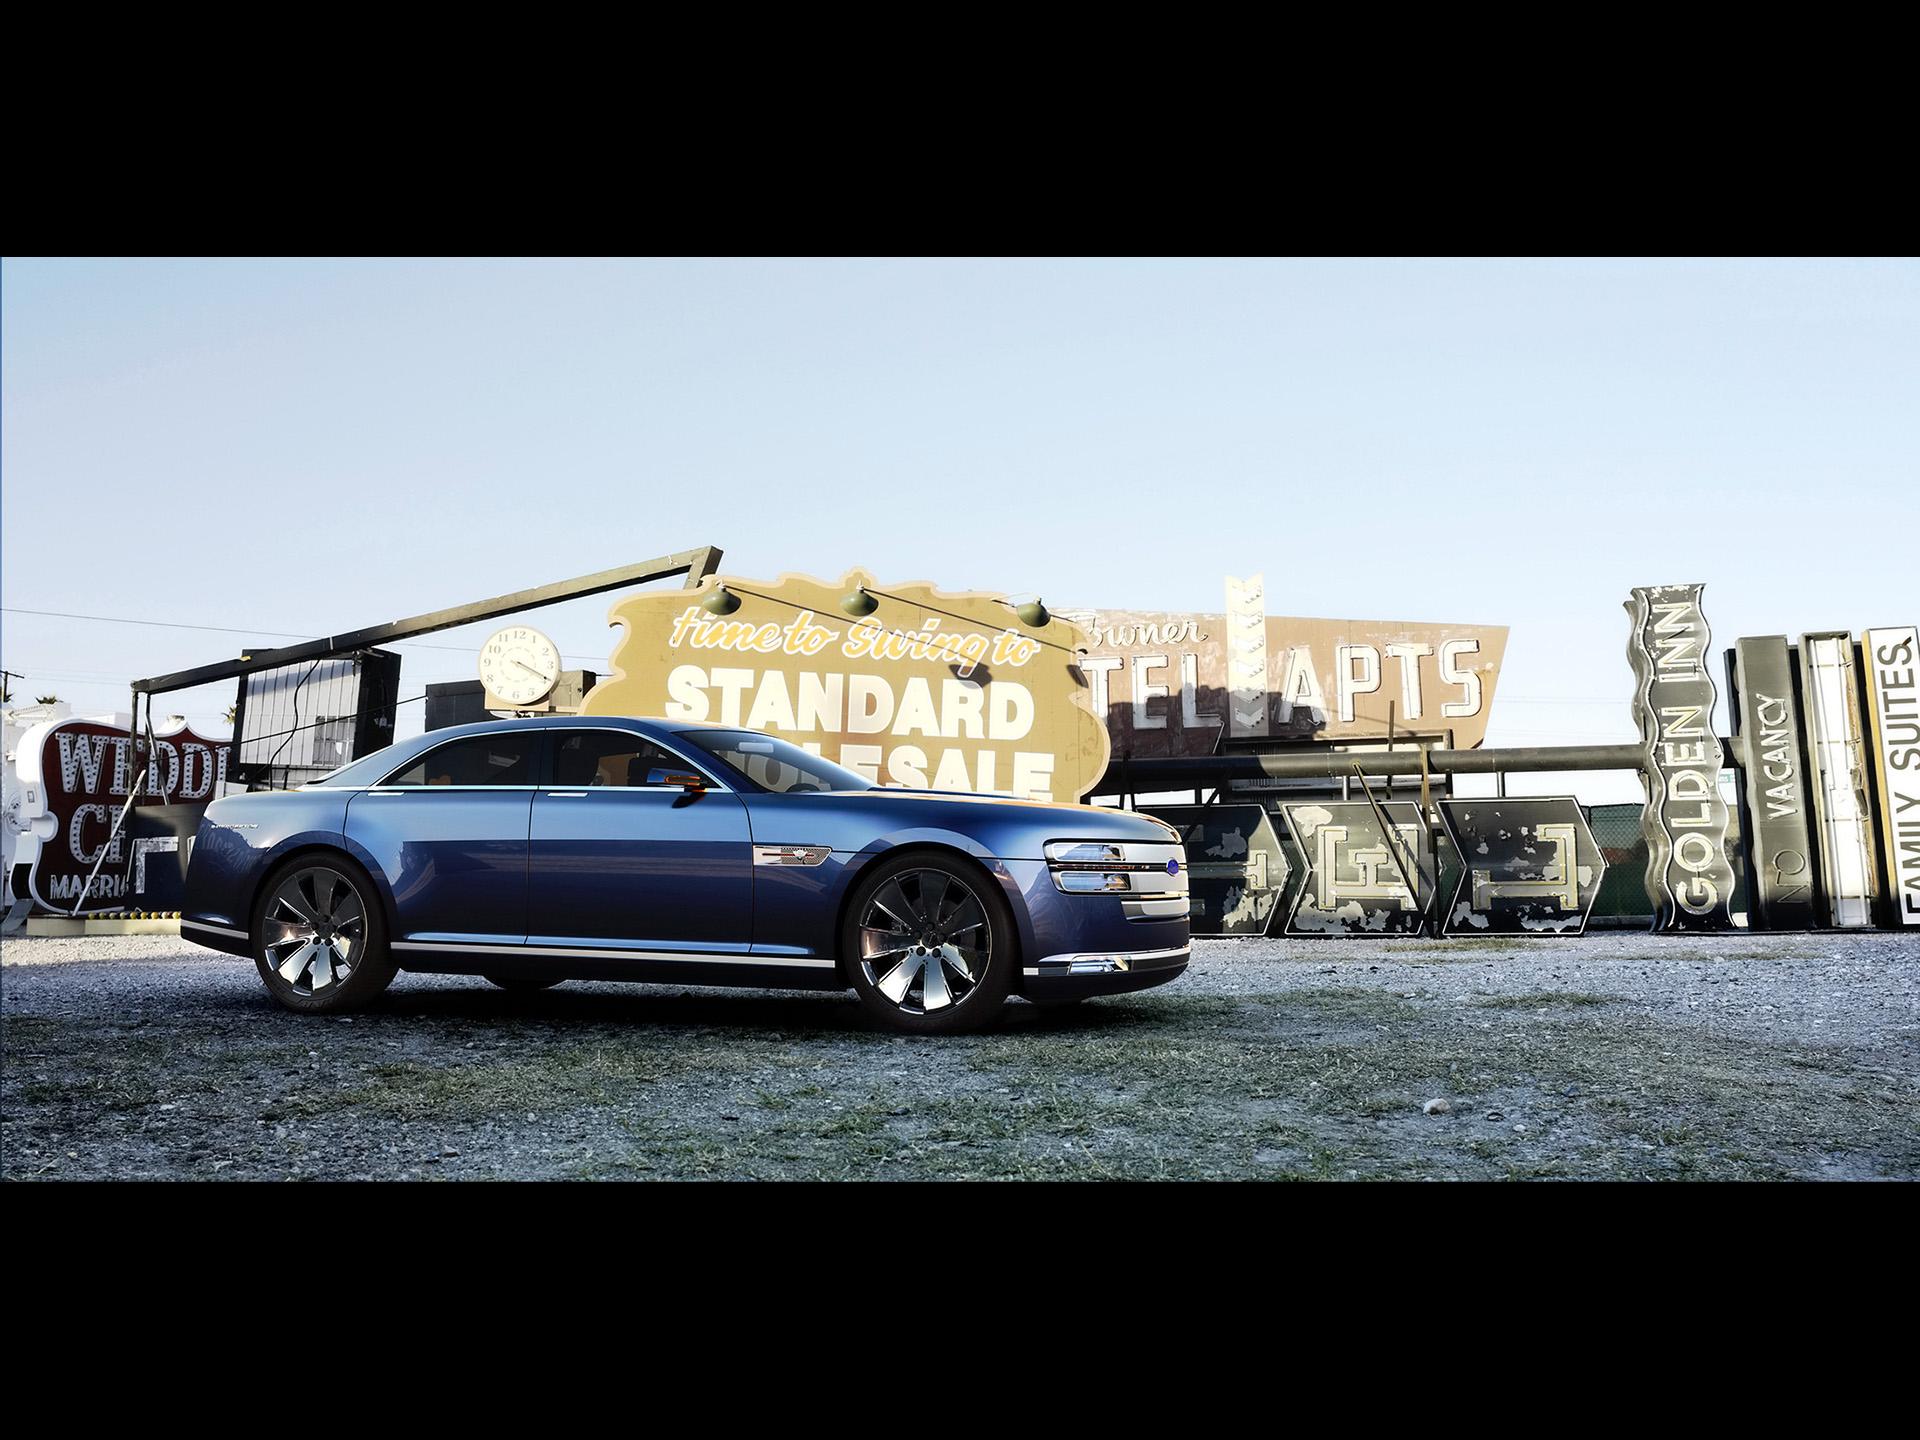 Mustang sedan and station wagon myth busted or not